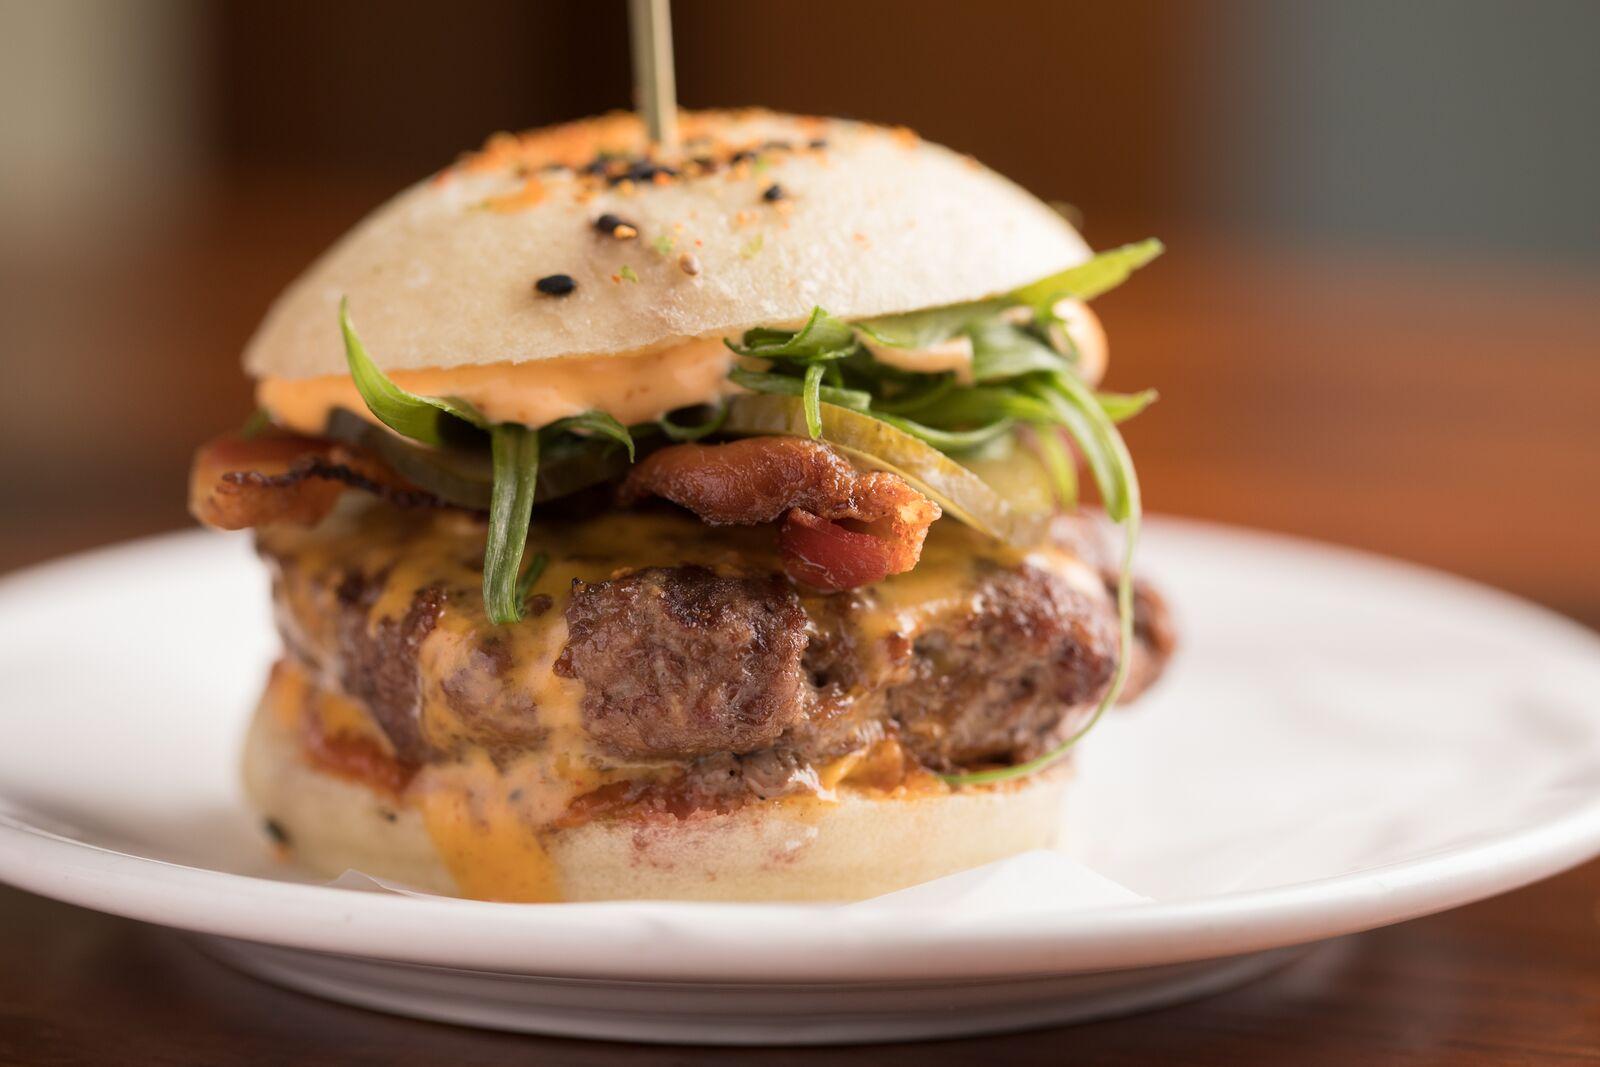 The Shojonator burger